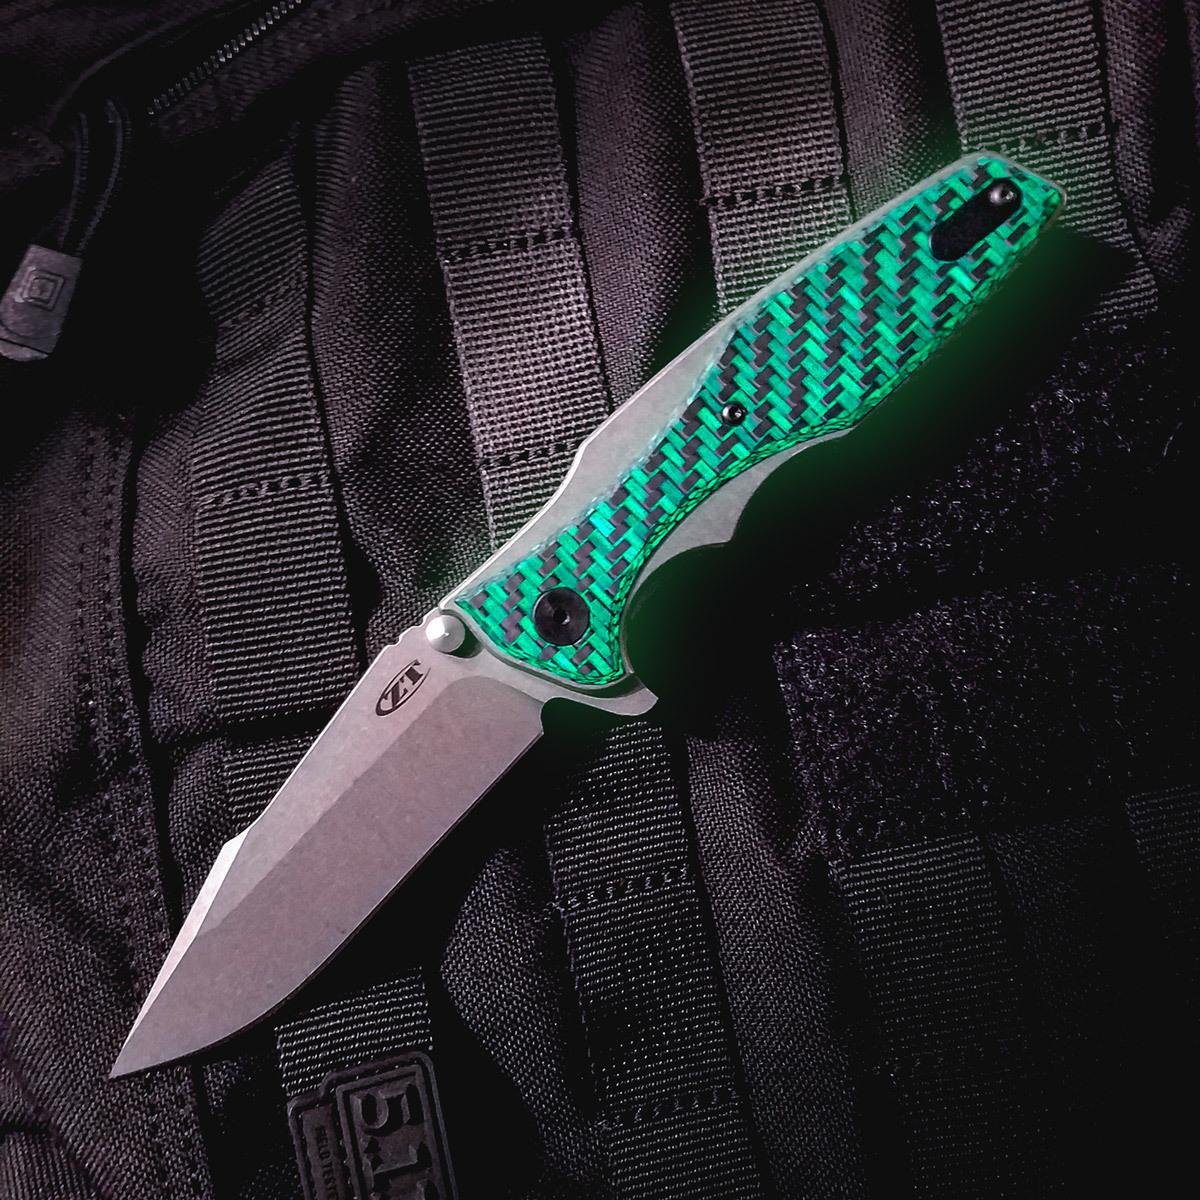 Фото 3 - Складной нож Zero Tolerance 0393GLCF, сталь CPM-20CV, рукоять титан/карбон